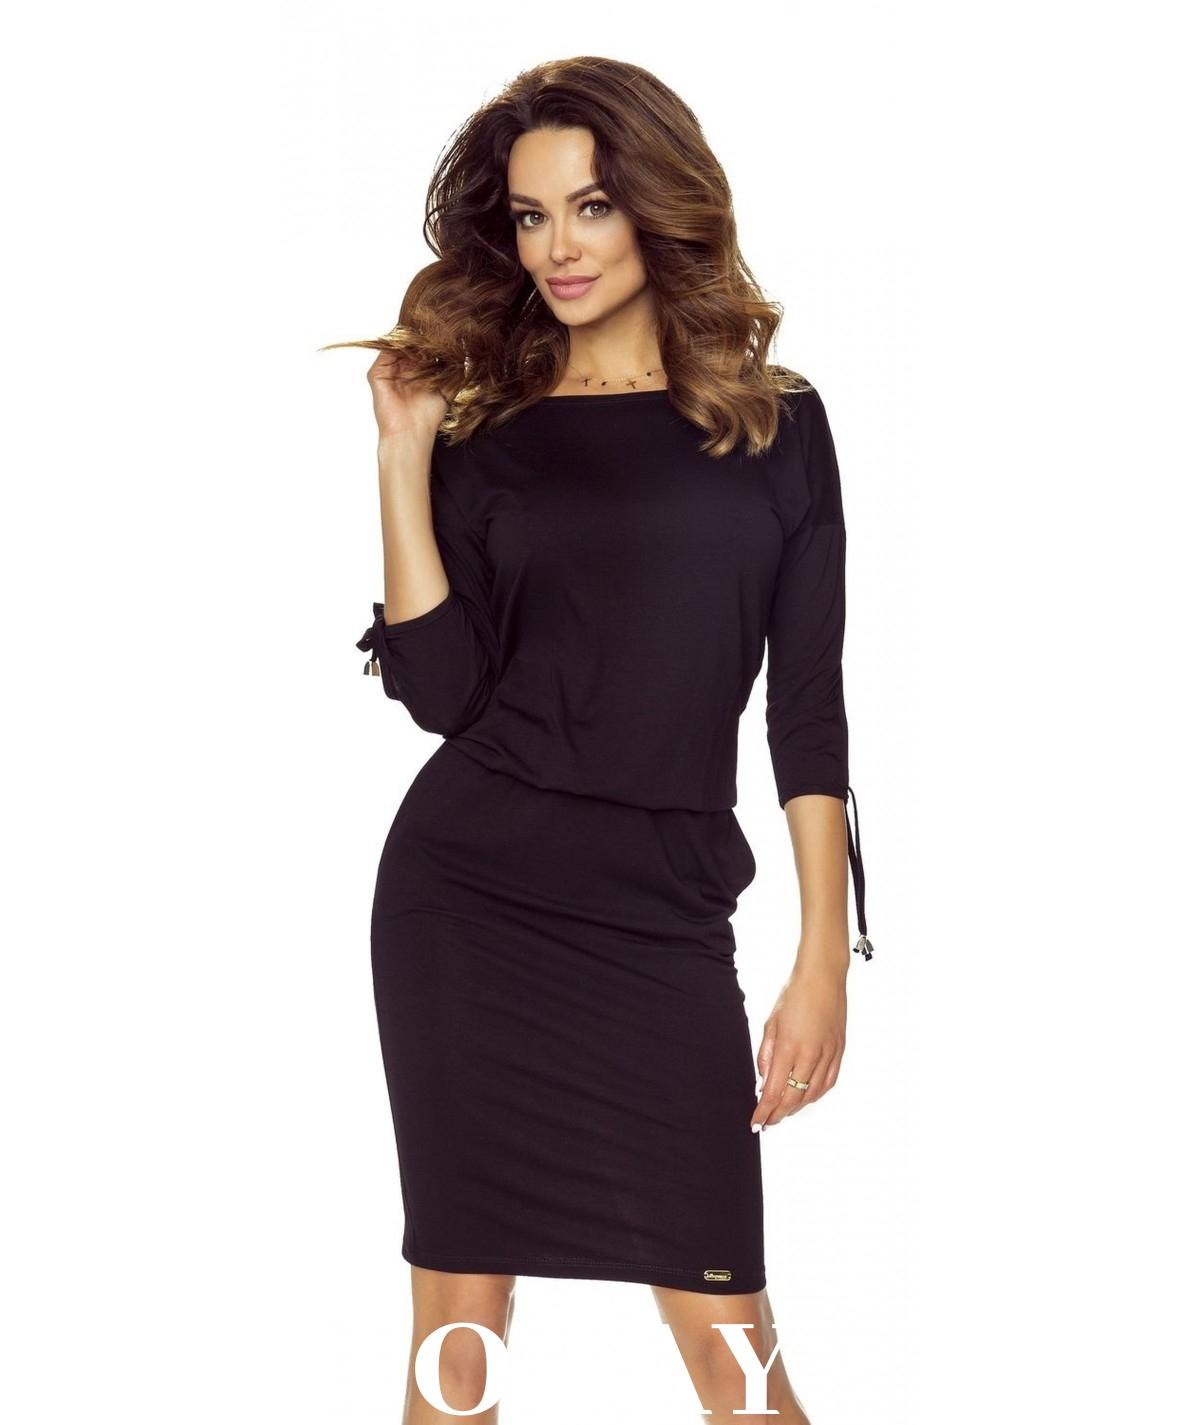 czarna sukienka dzienna - venus model marki bergamo